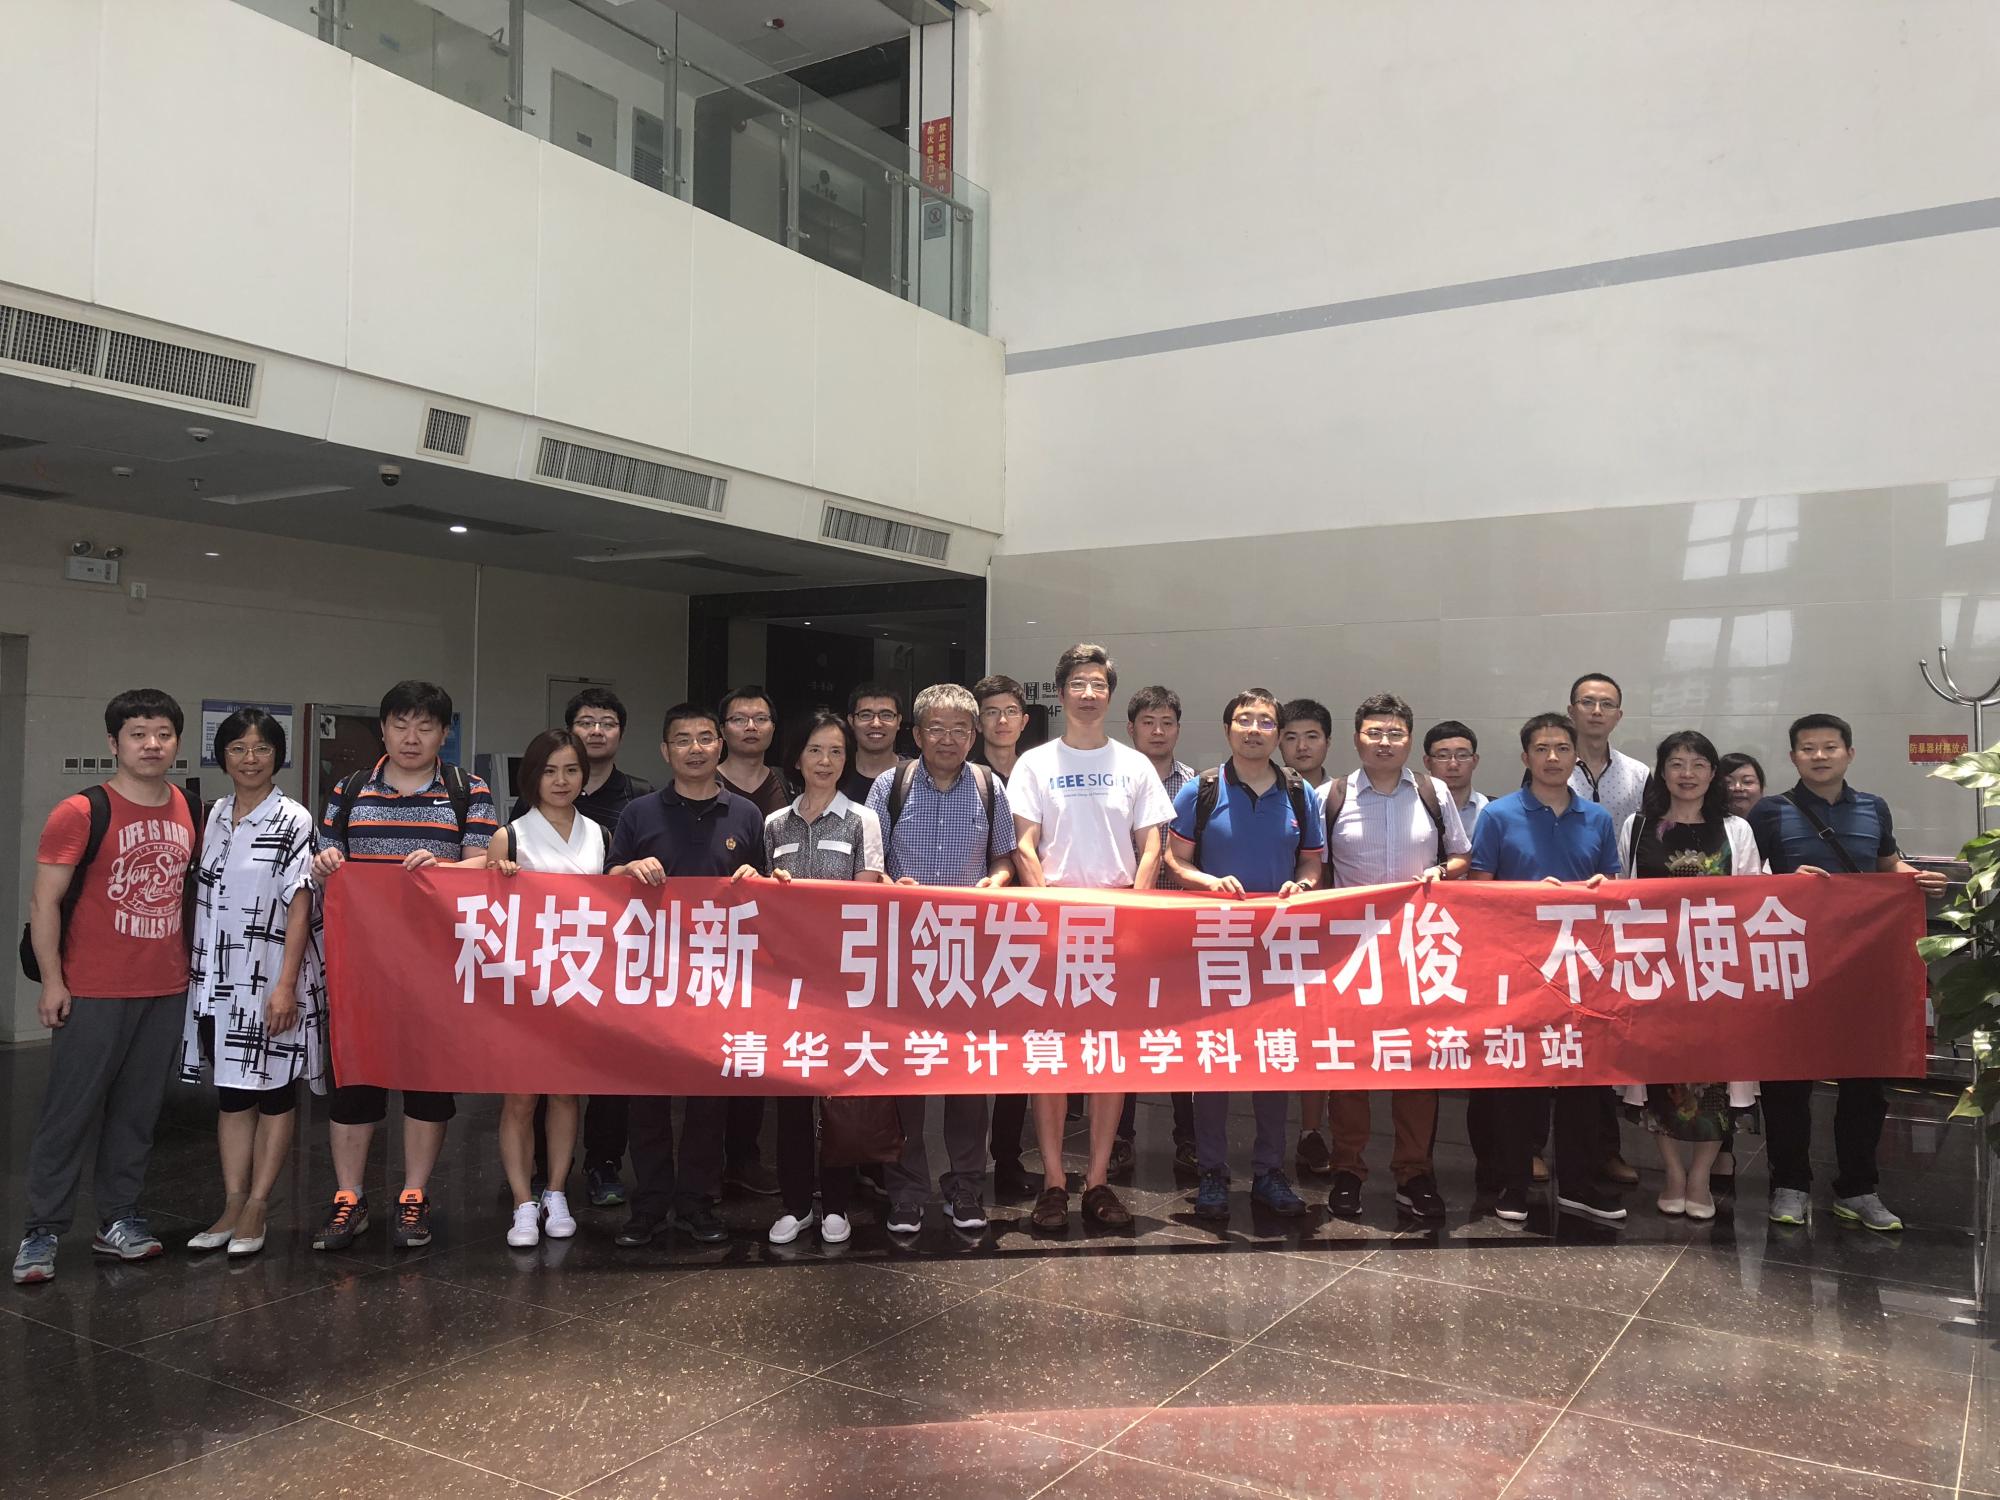 Computer Science Postdocs from Tsinghua University Visits SUSTech